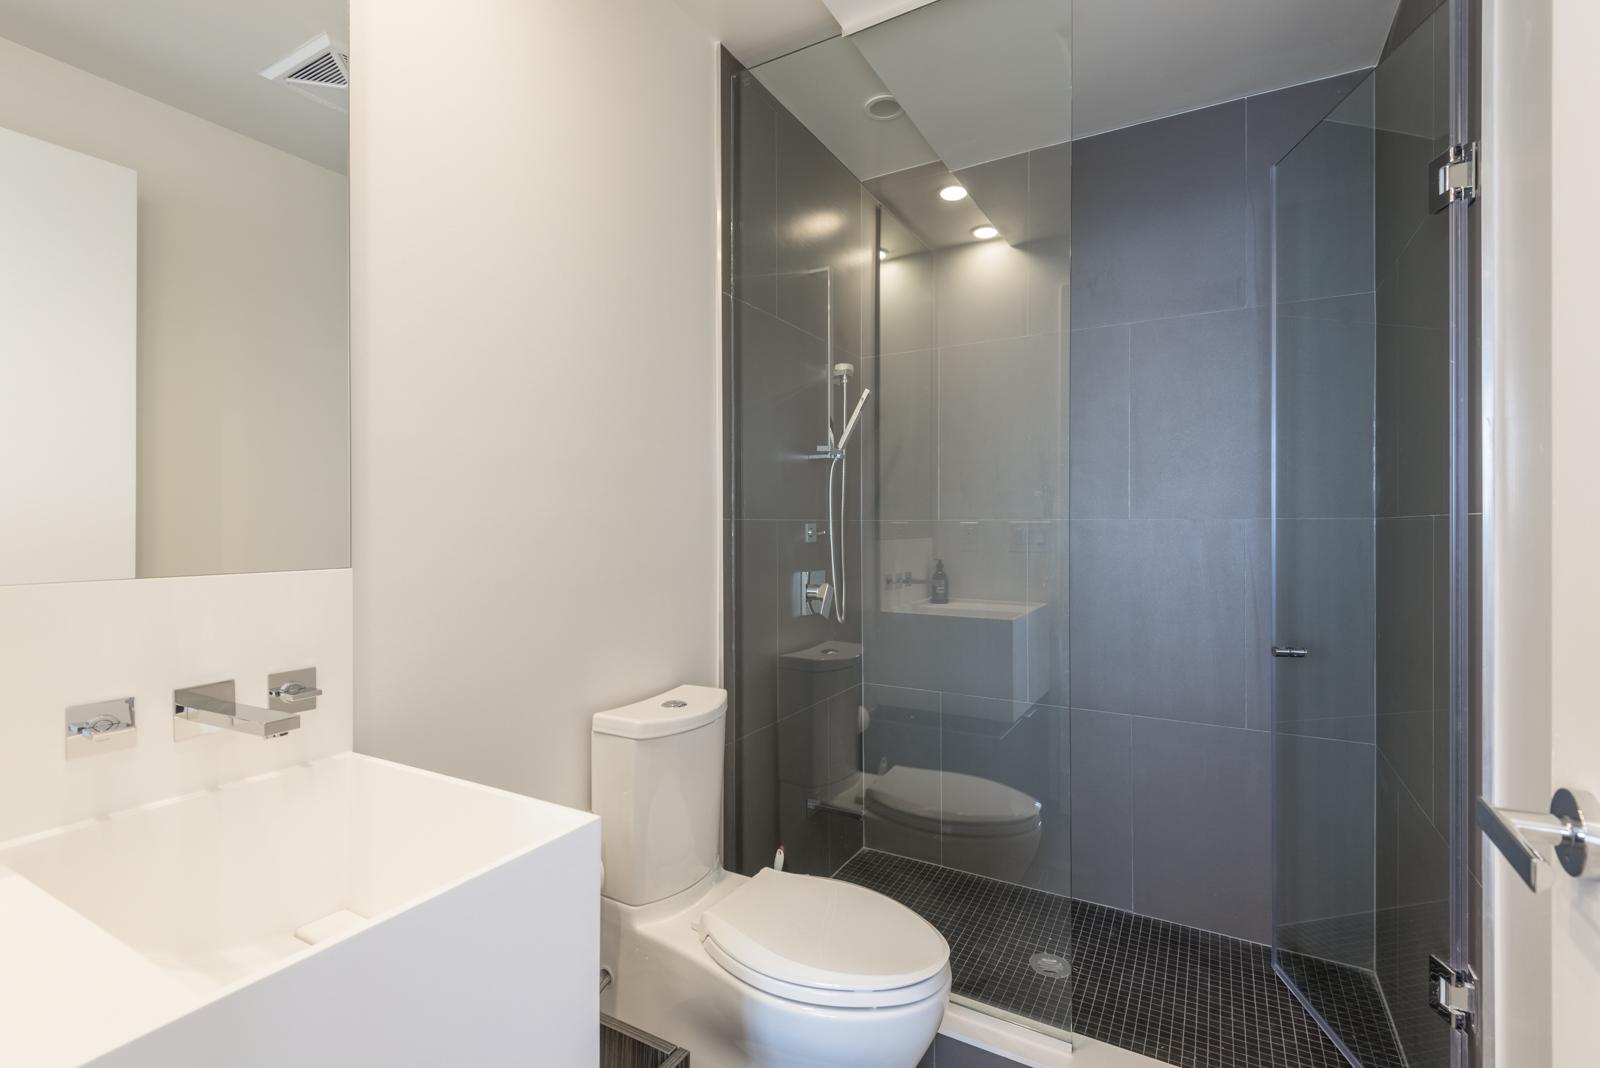 Photo showing condo bathroom with walk-in shower